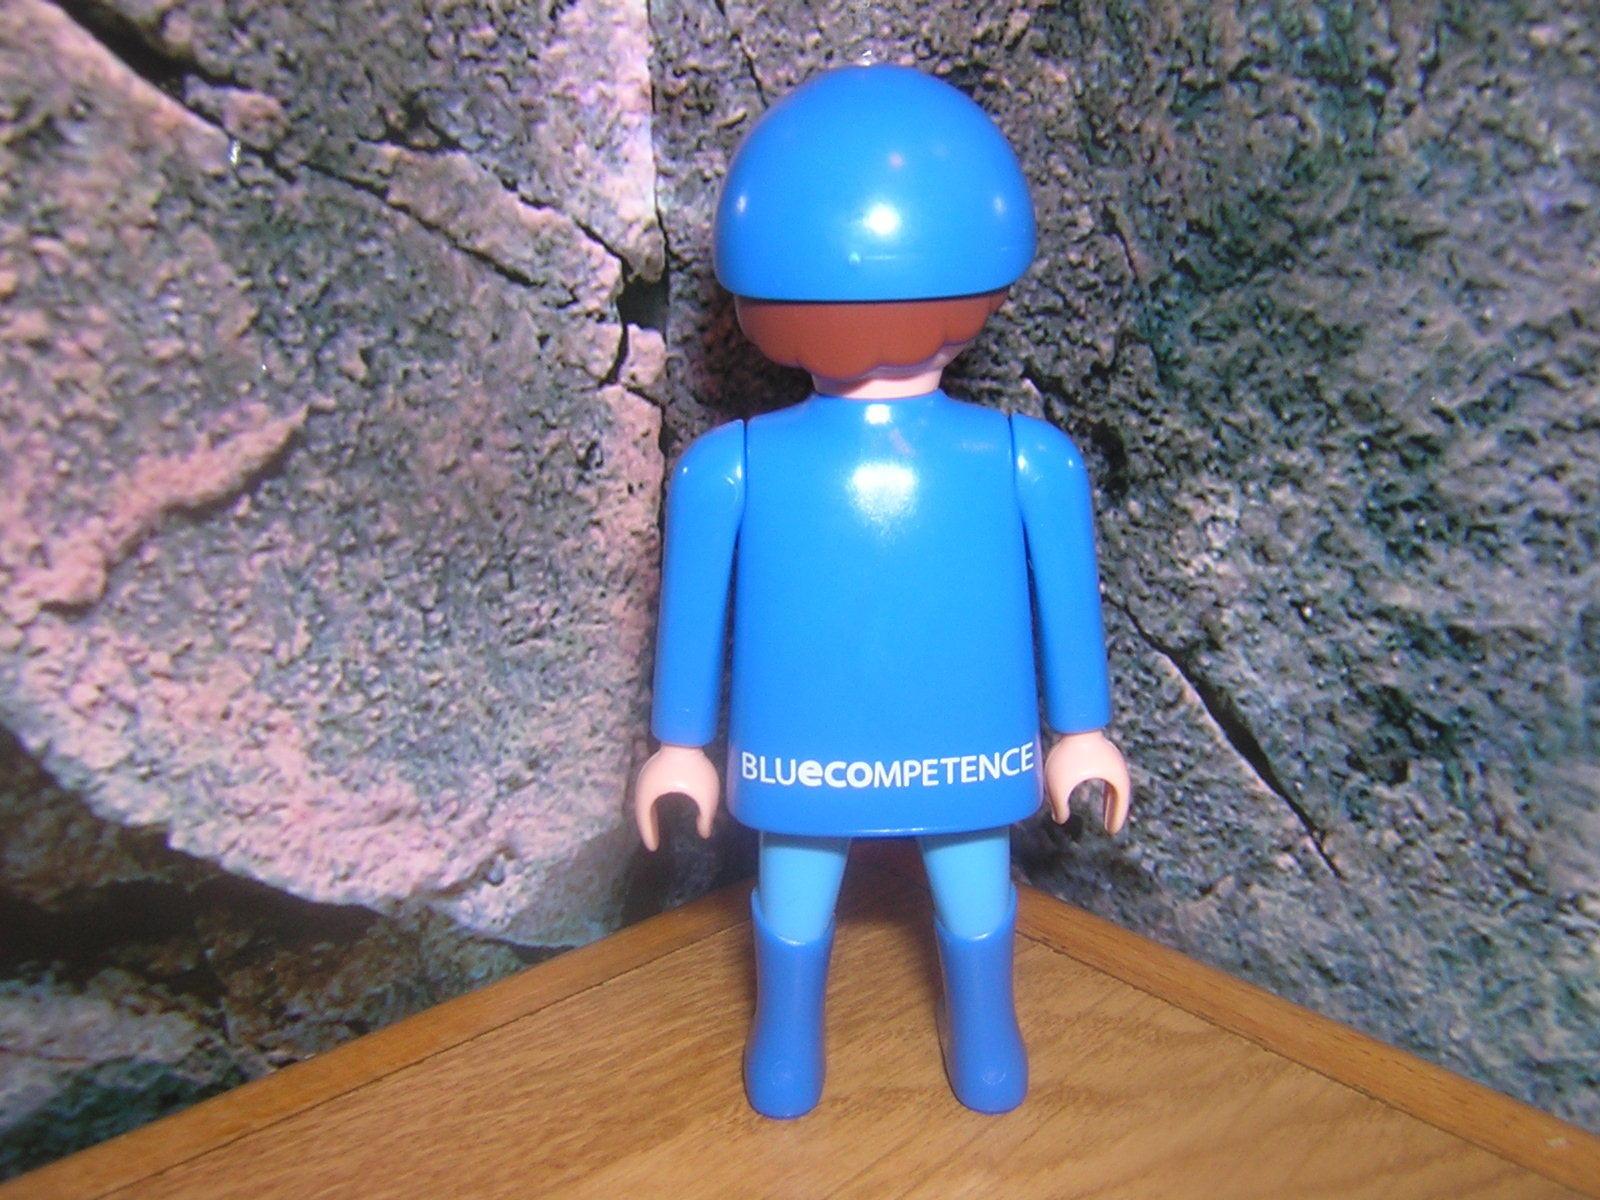 ( A A A 3   2 ) Promo Figur blueECOMPETENCE Werbefigur Sonderfigur Give Away K-Messe f7bb90